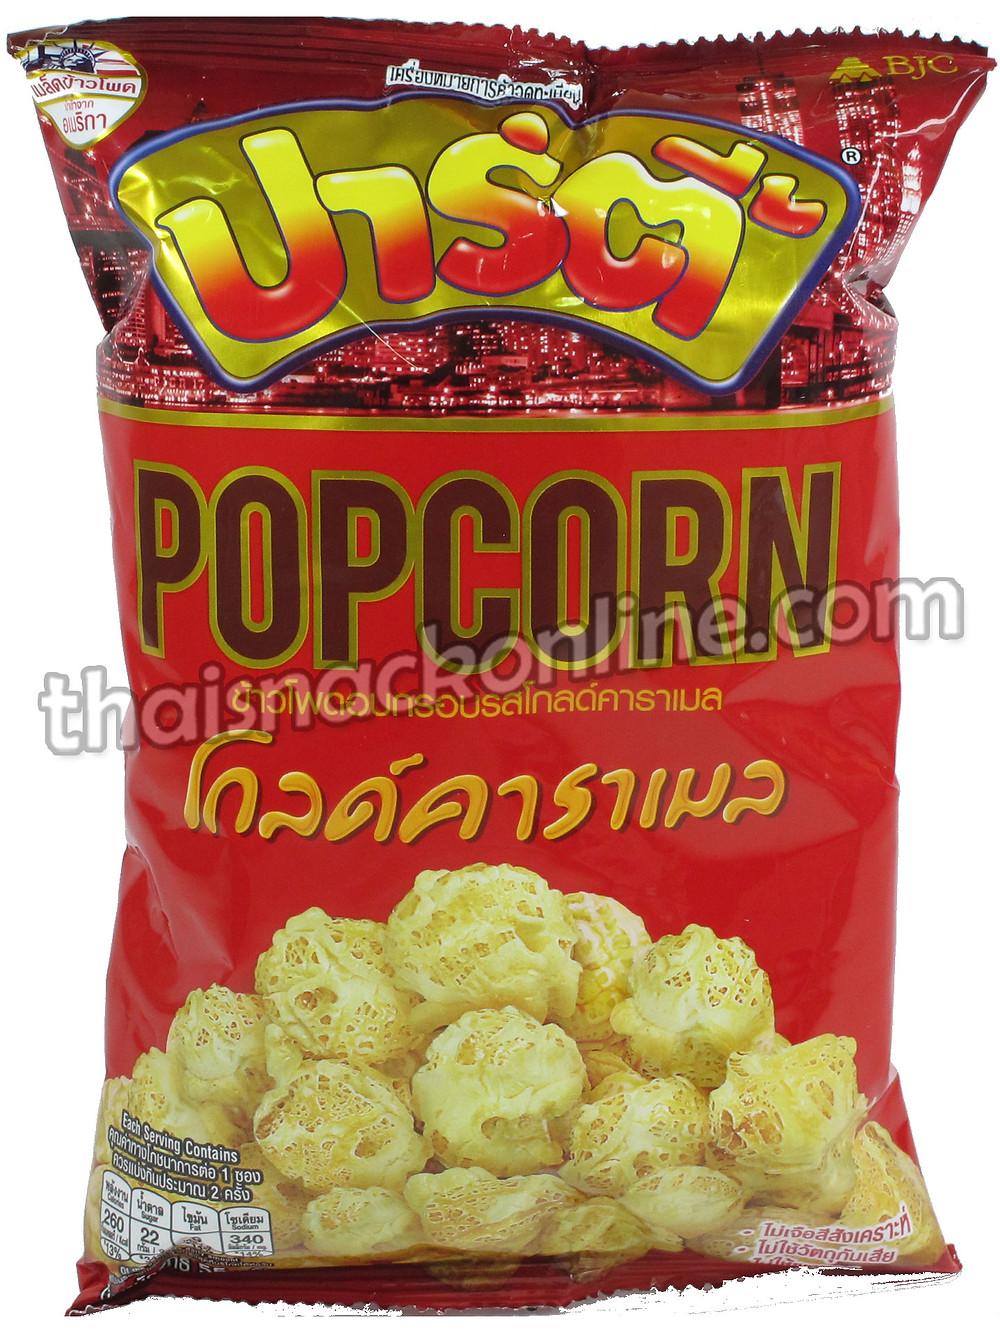 Party - Popcorn Caramel (55g)